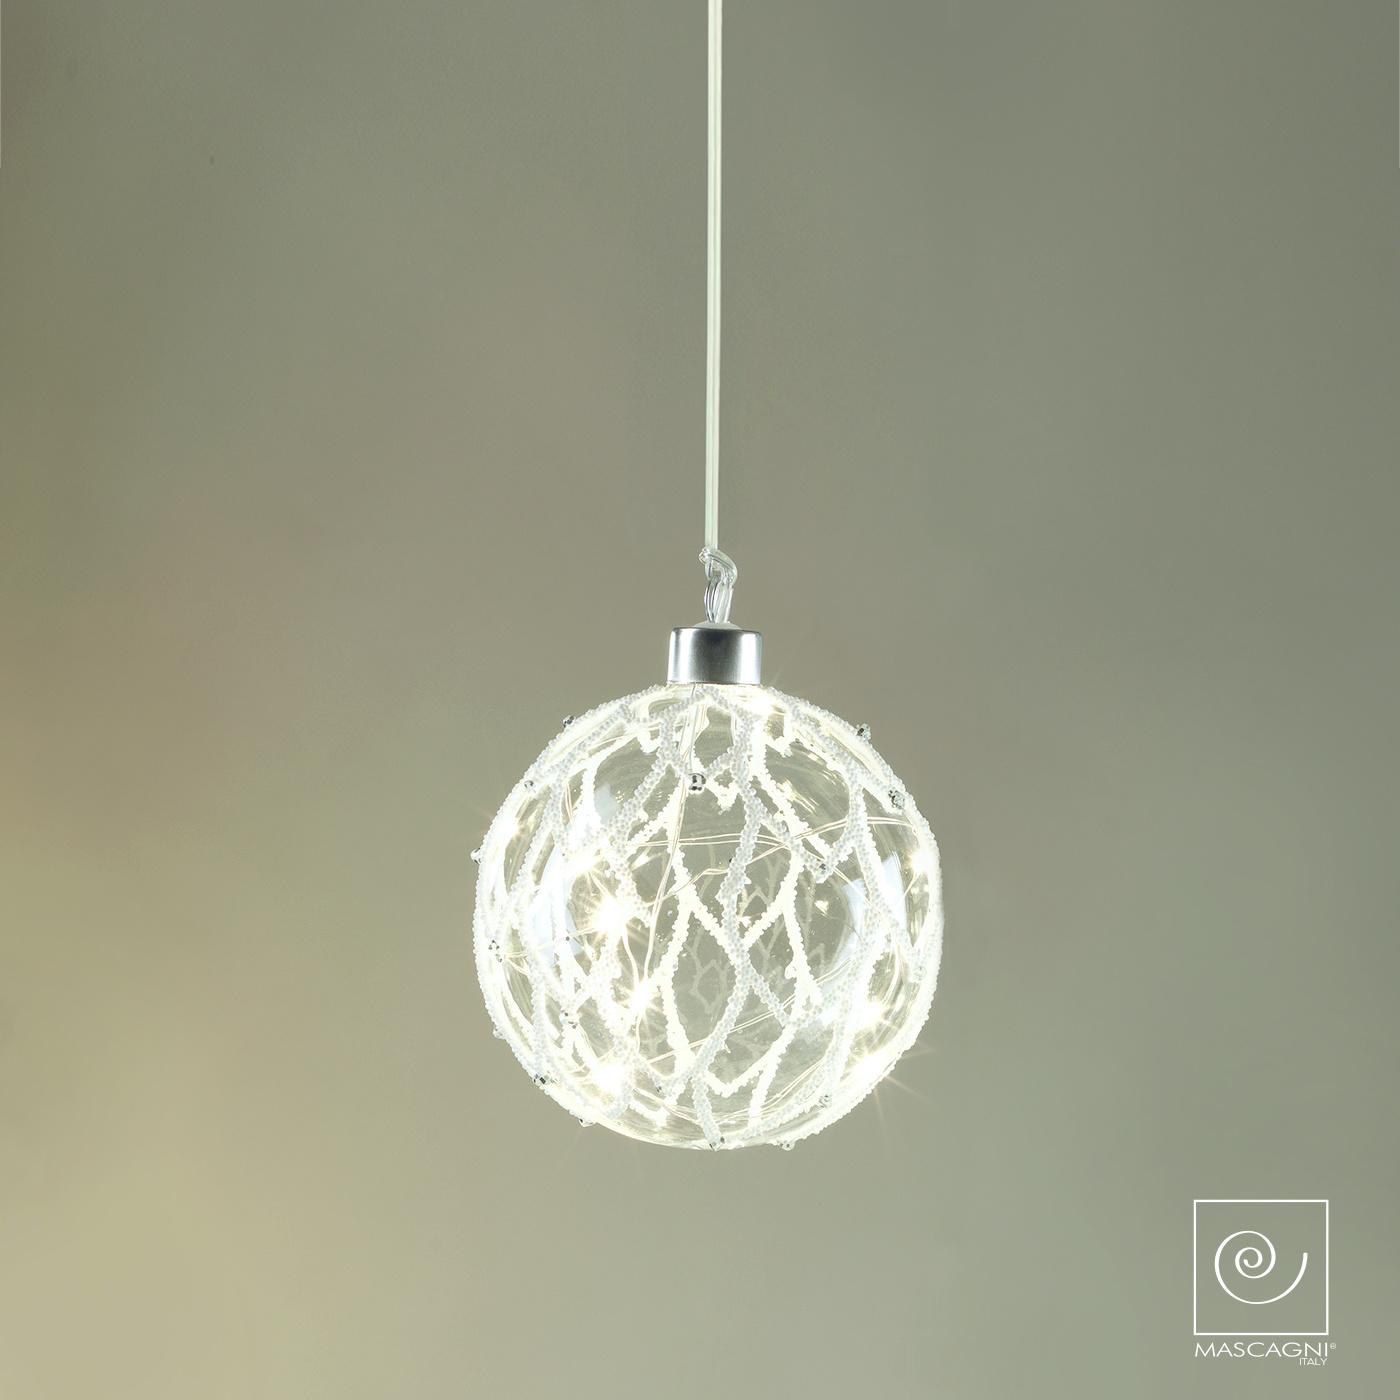 Art Mascagni LED BALL DIAM.10